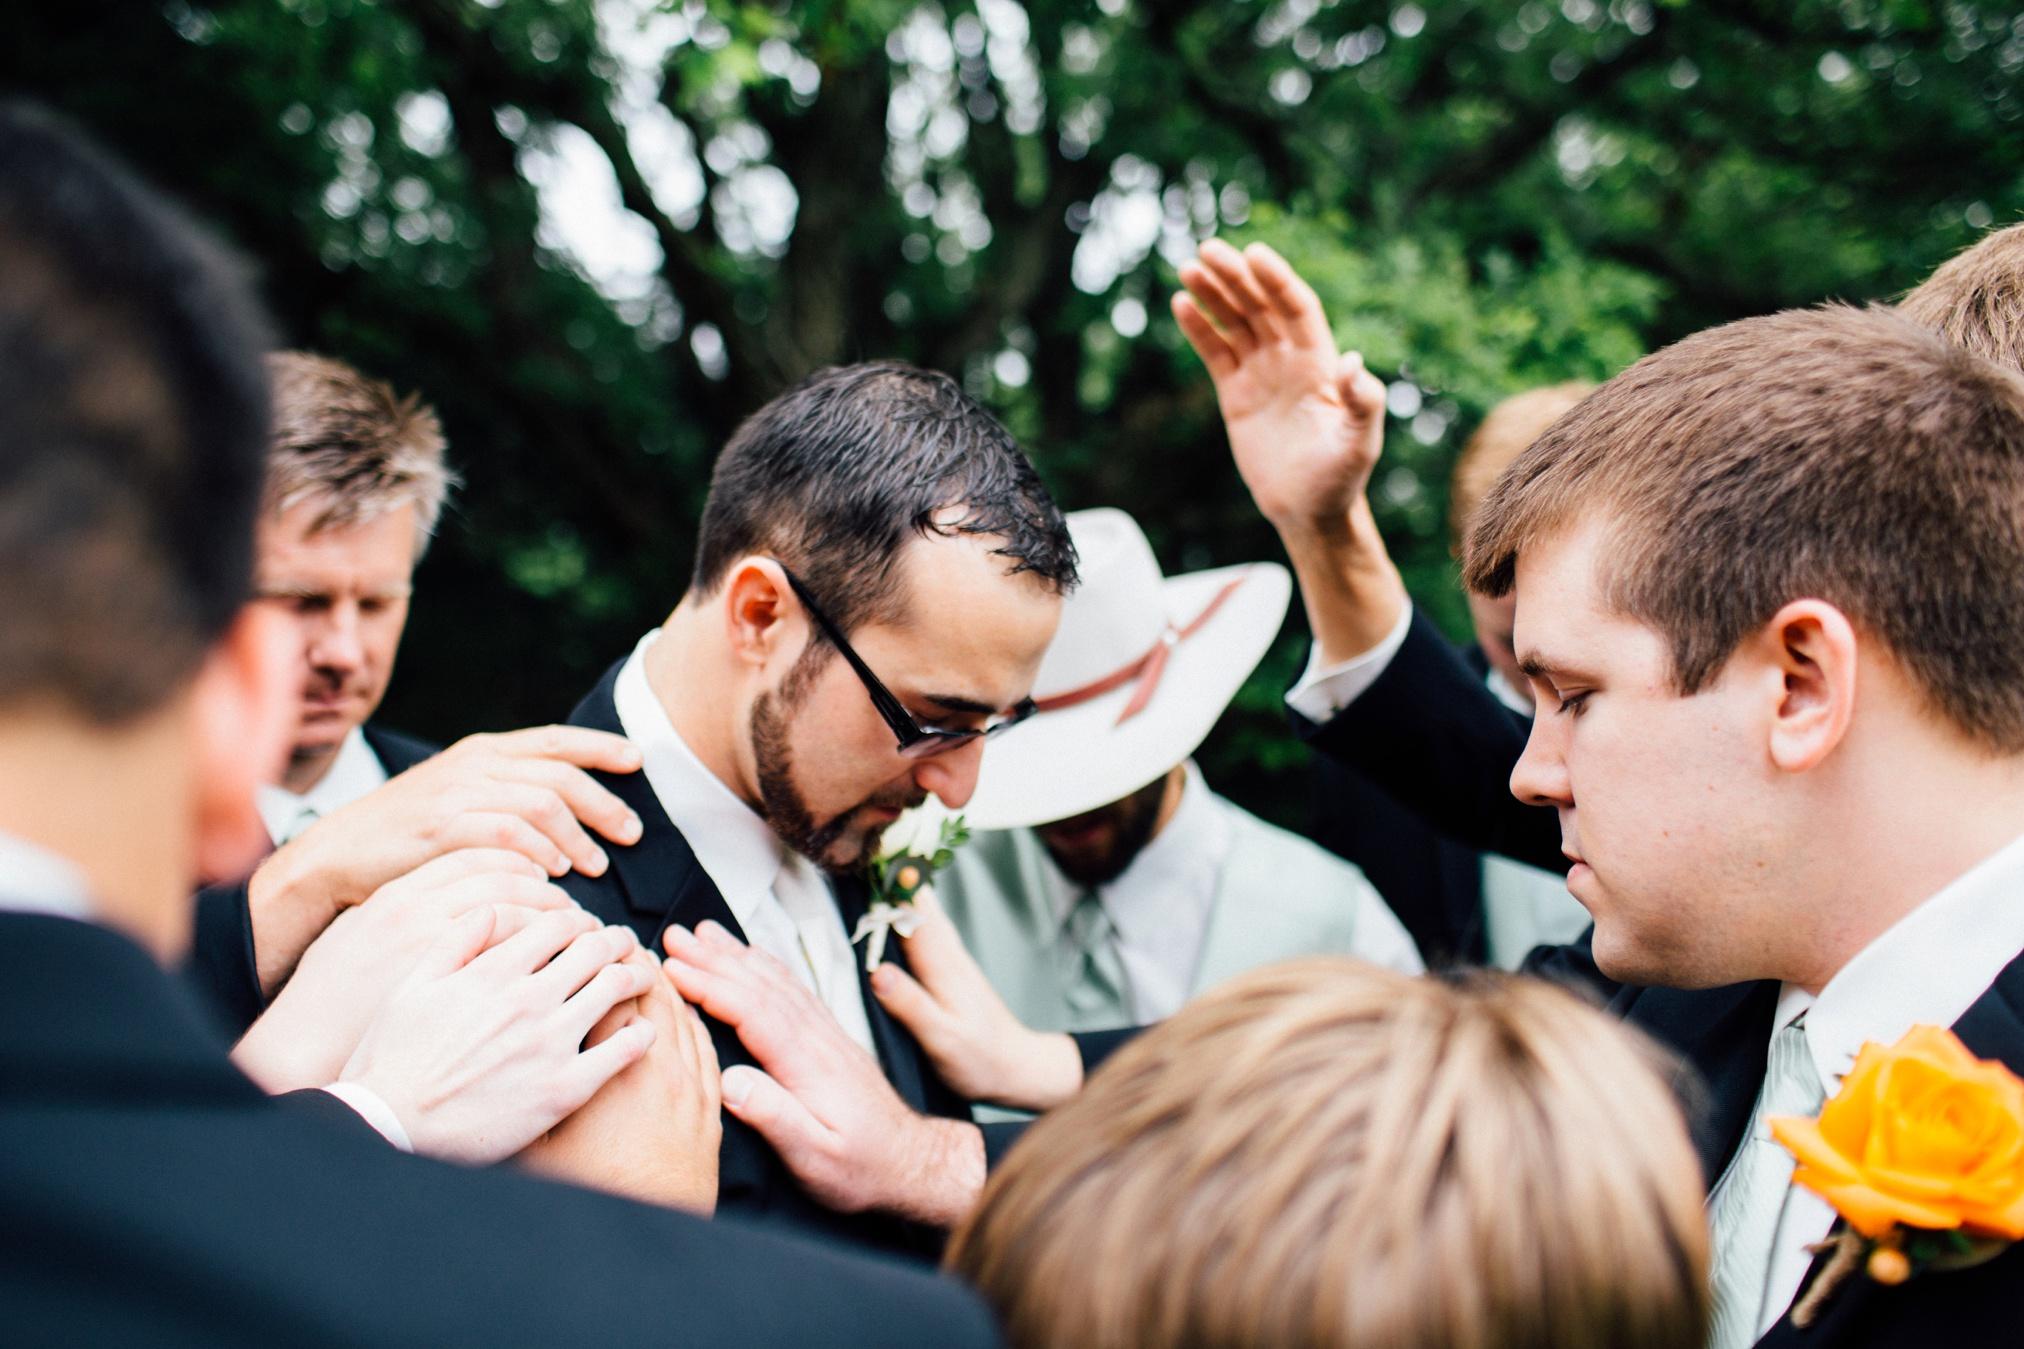 schmid_wedding-240.jpg